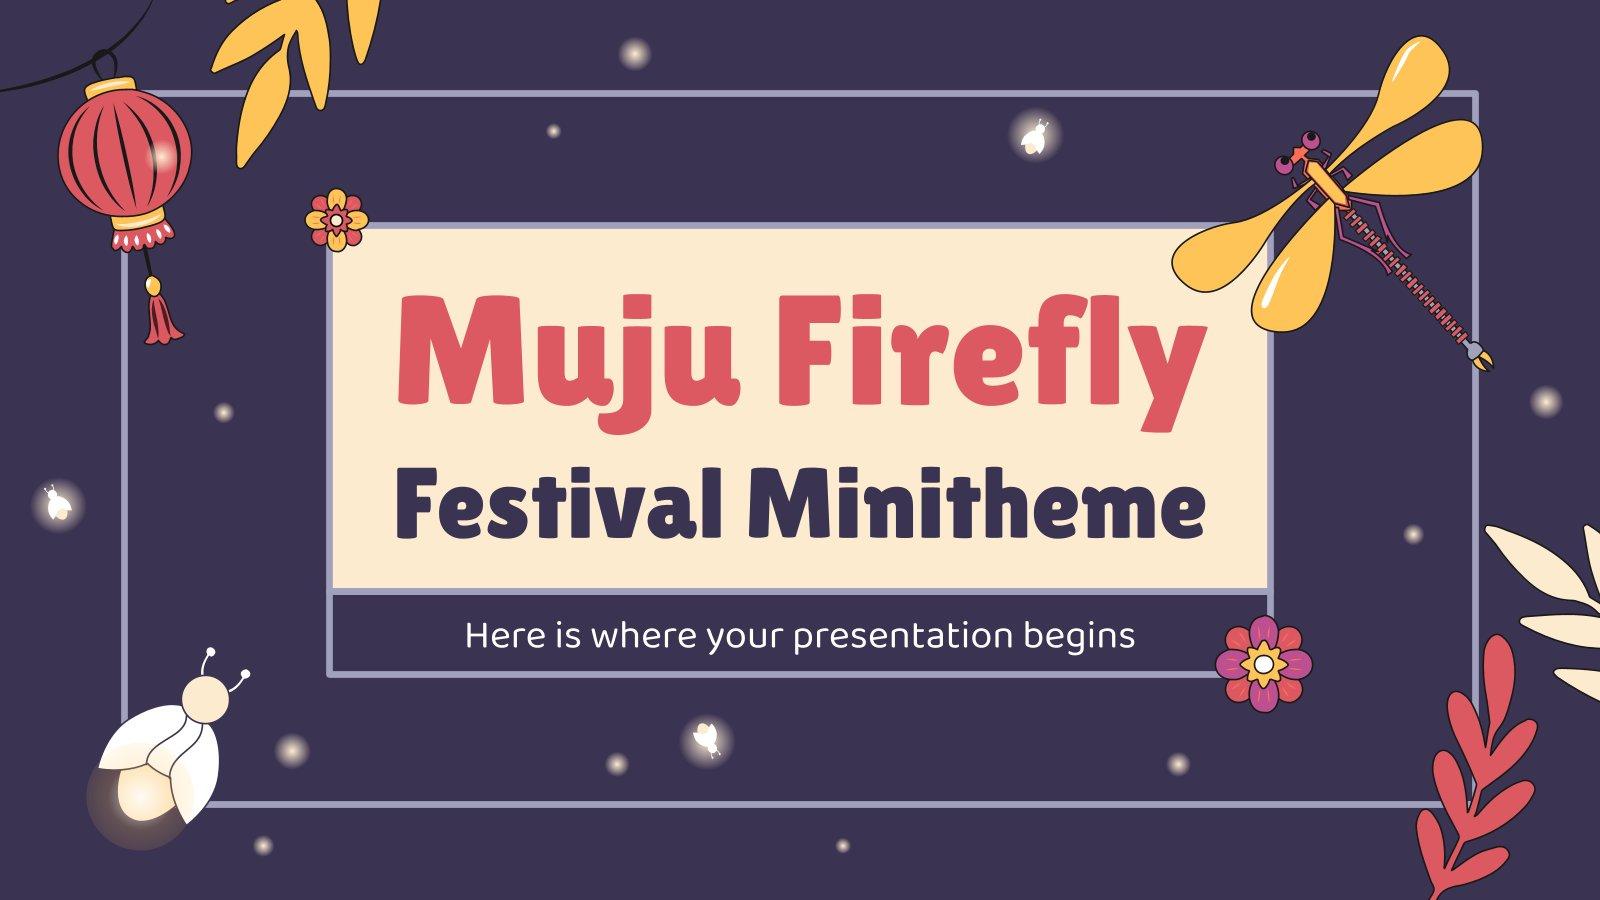 Muju Firefly Festival Minitheme presentation template